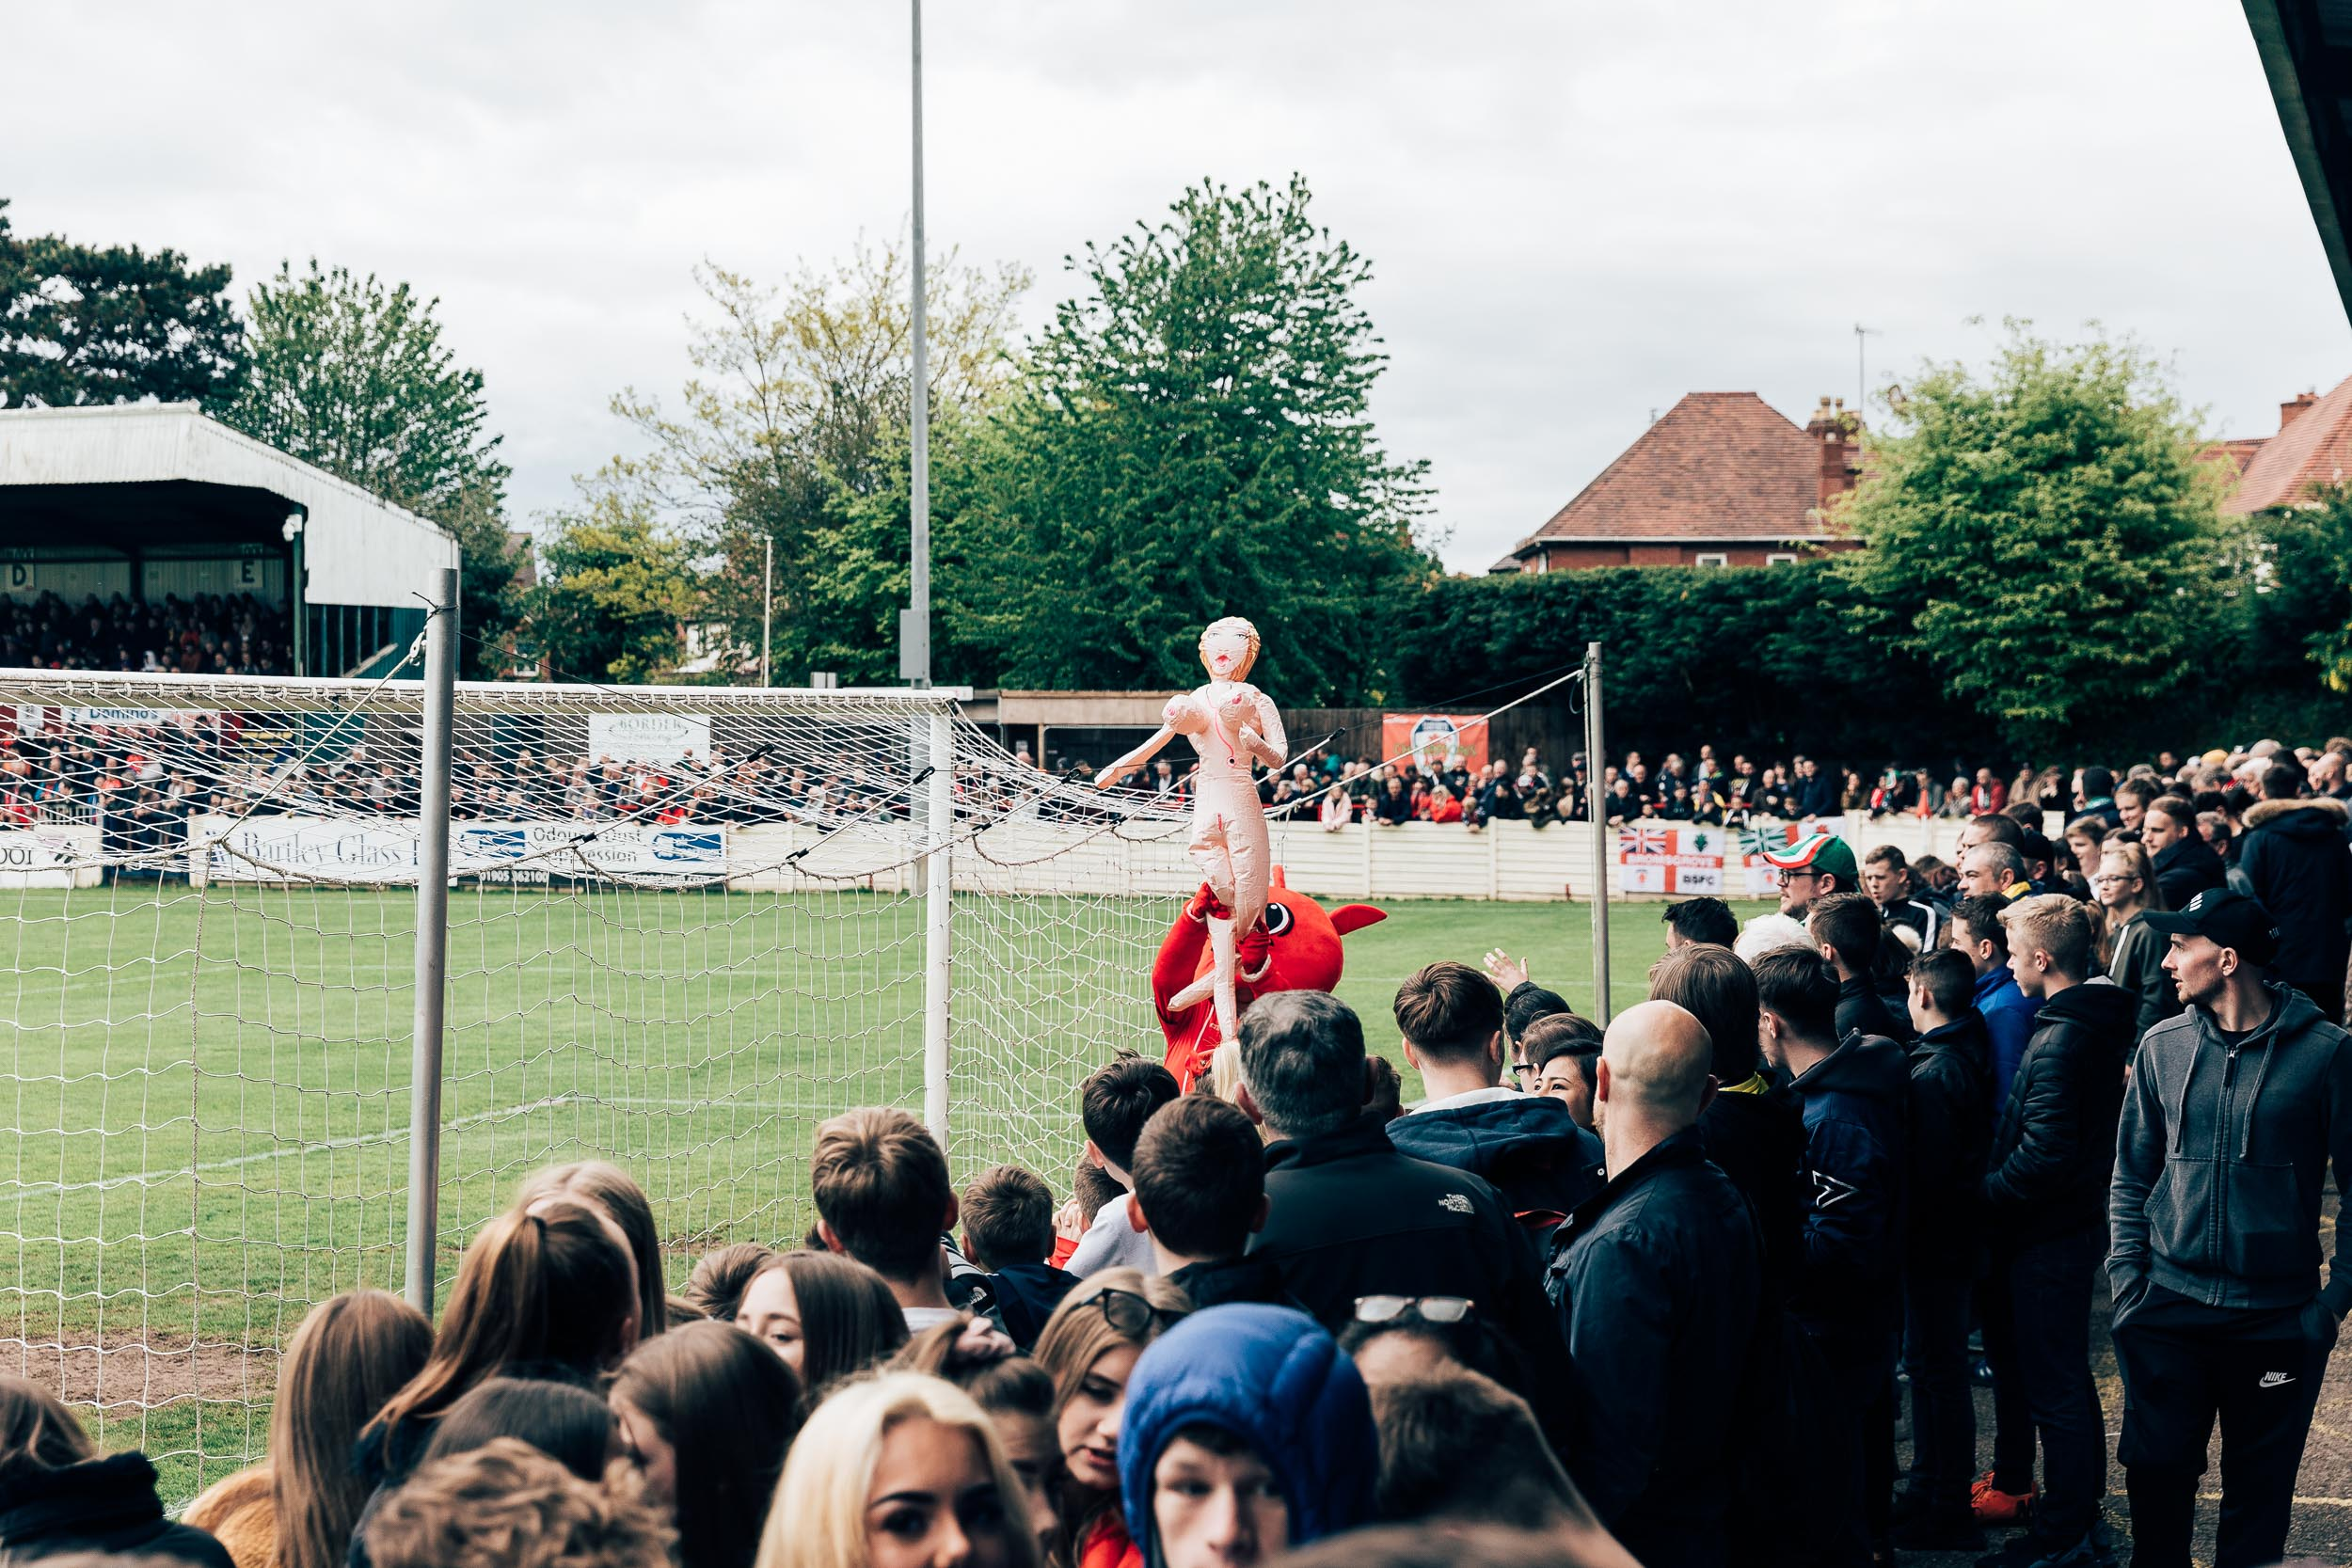 06_05_2019_Bromsgrove_Sporting_Corby-48.jpg